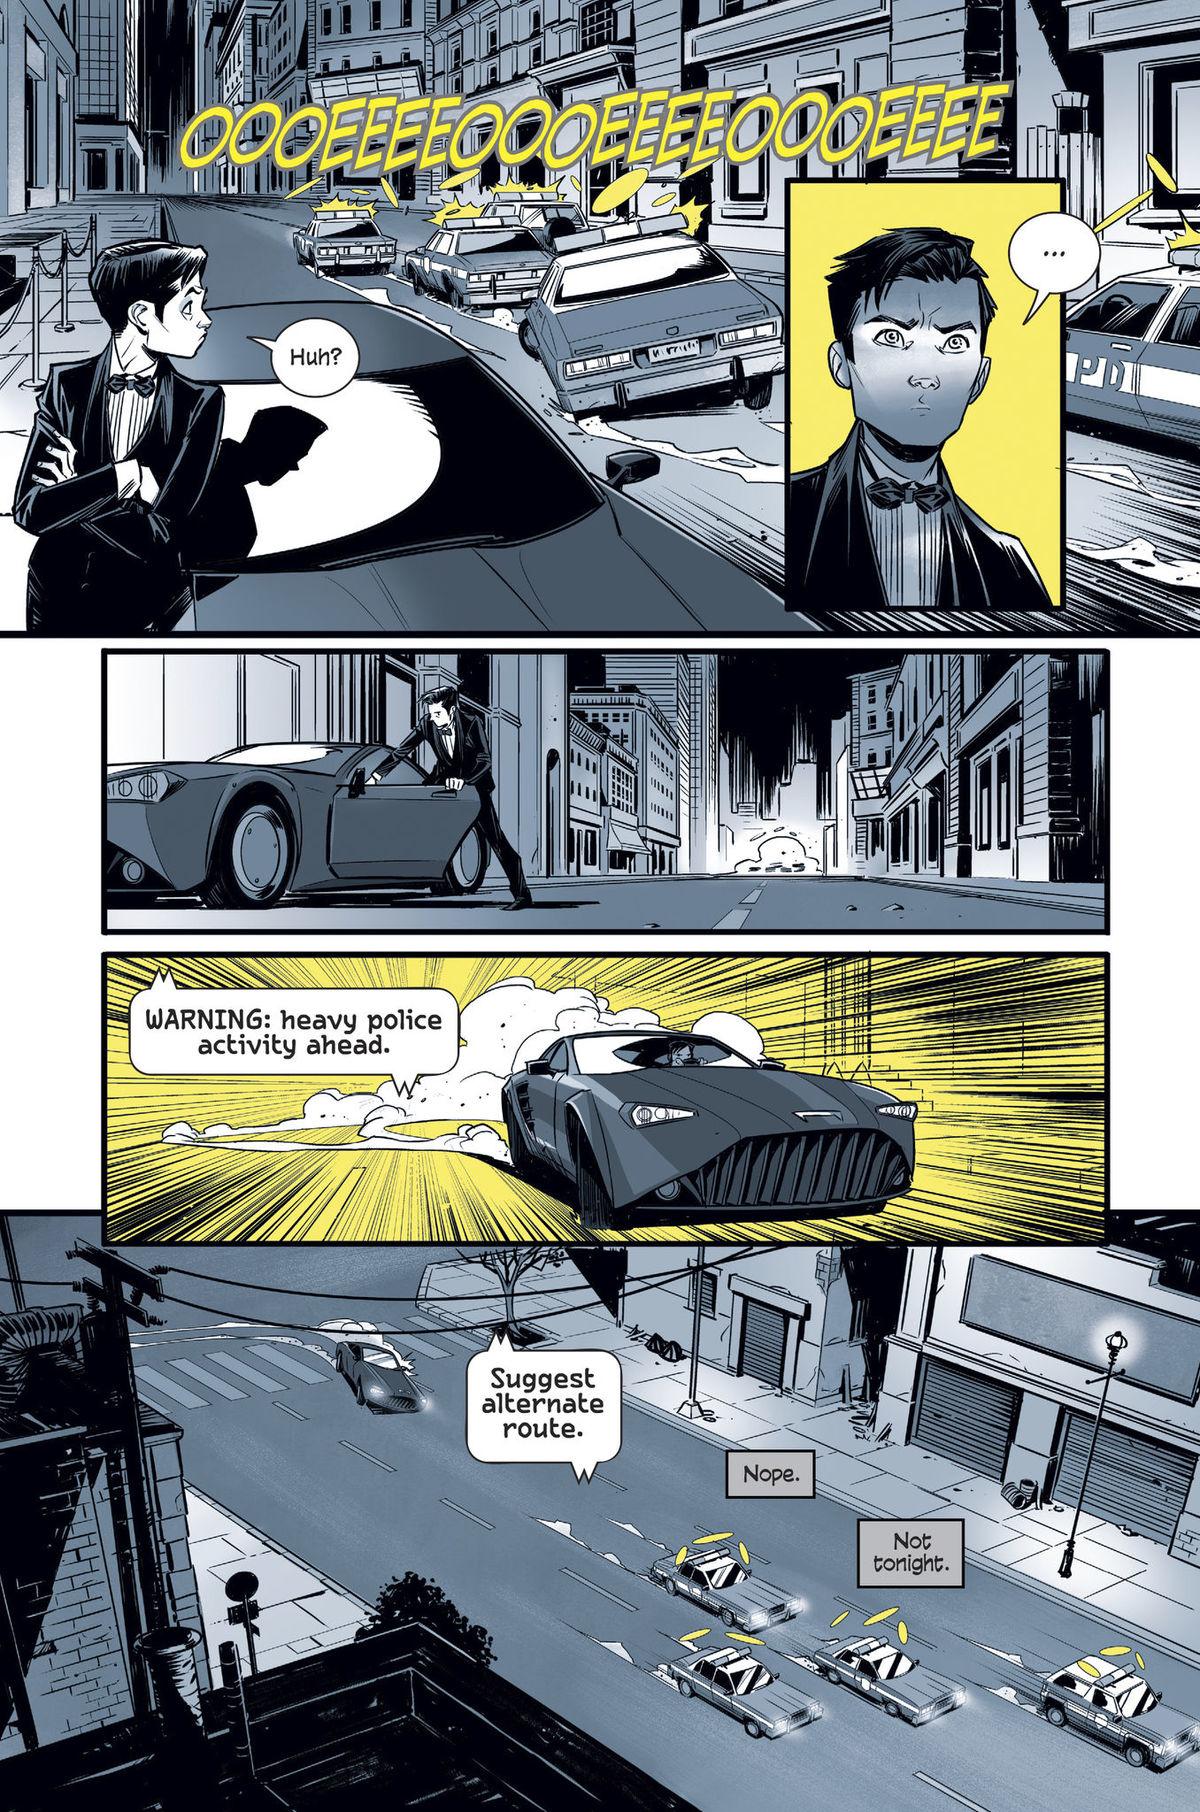 Bruce Wayne in Batman by DC (2019).